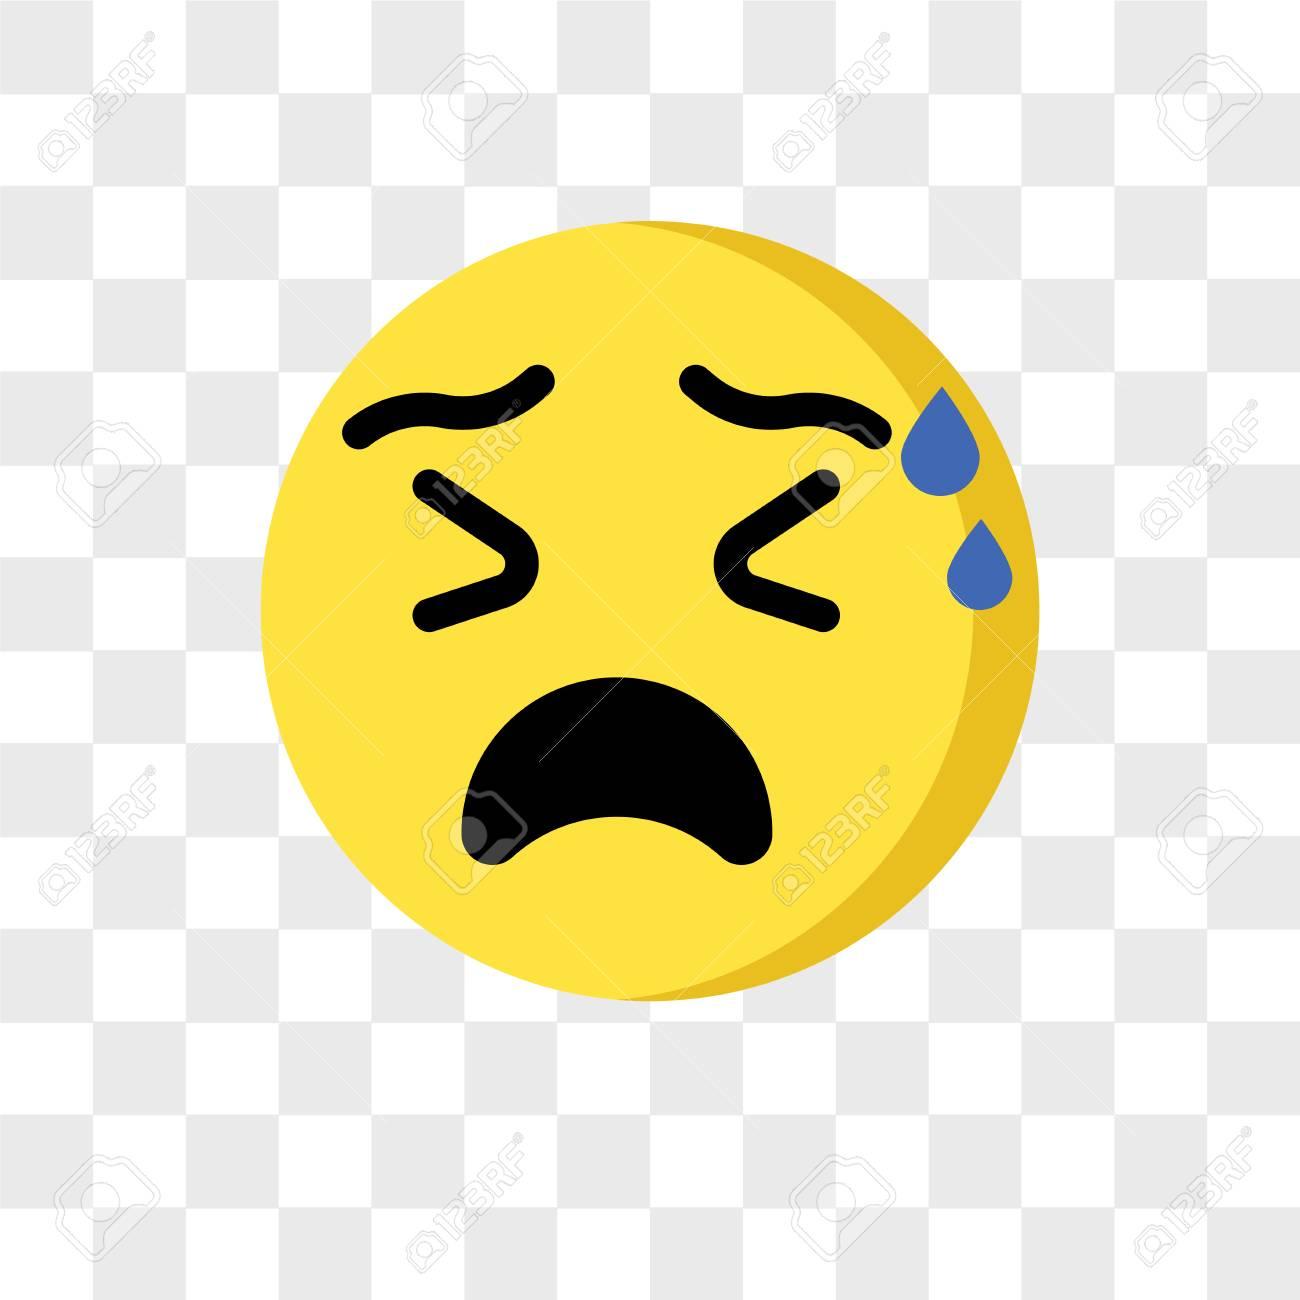 Nervous emoji vector icon isolated on transparent background,